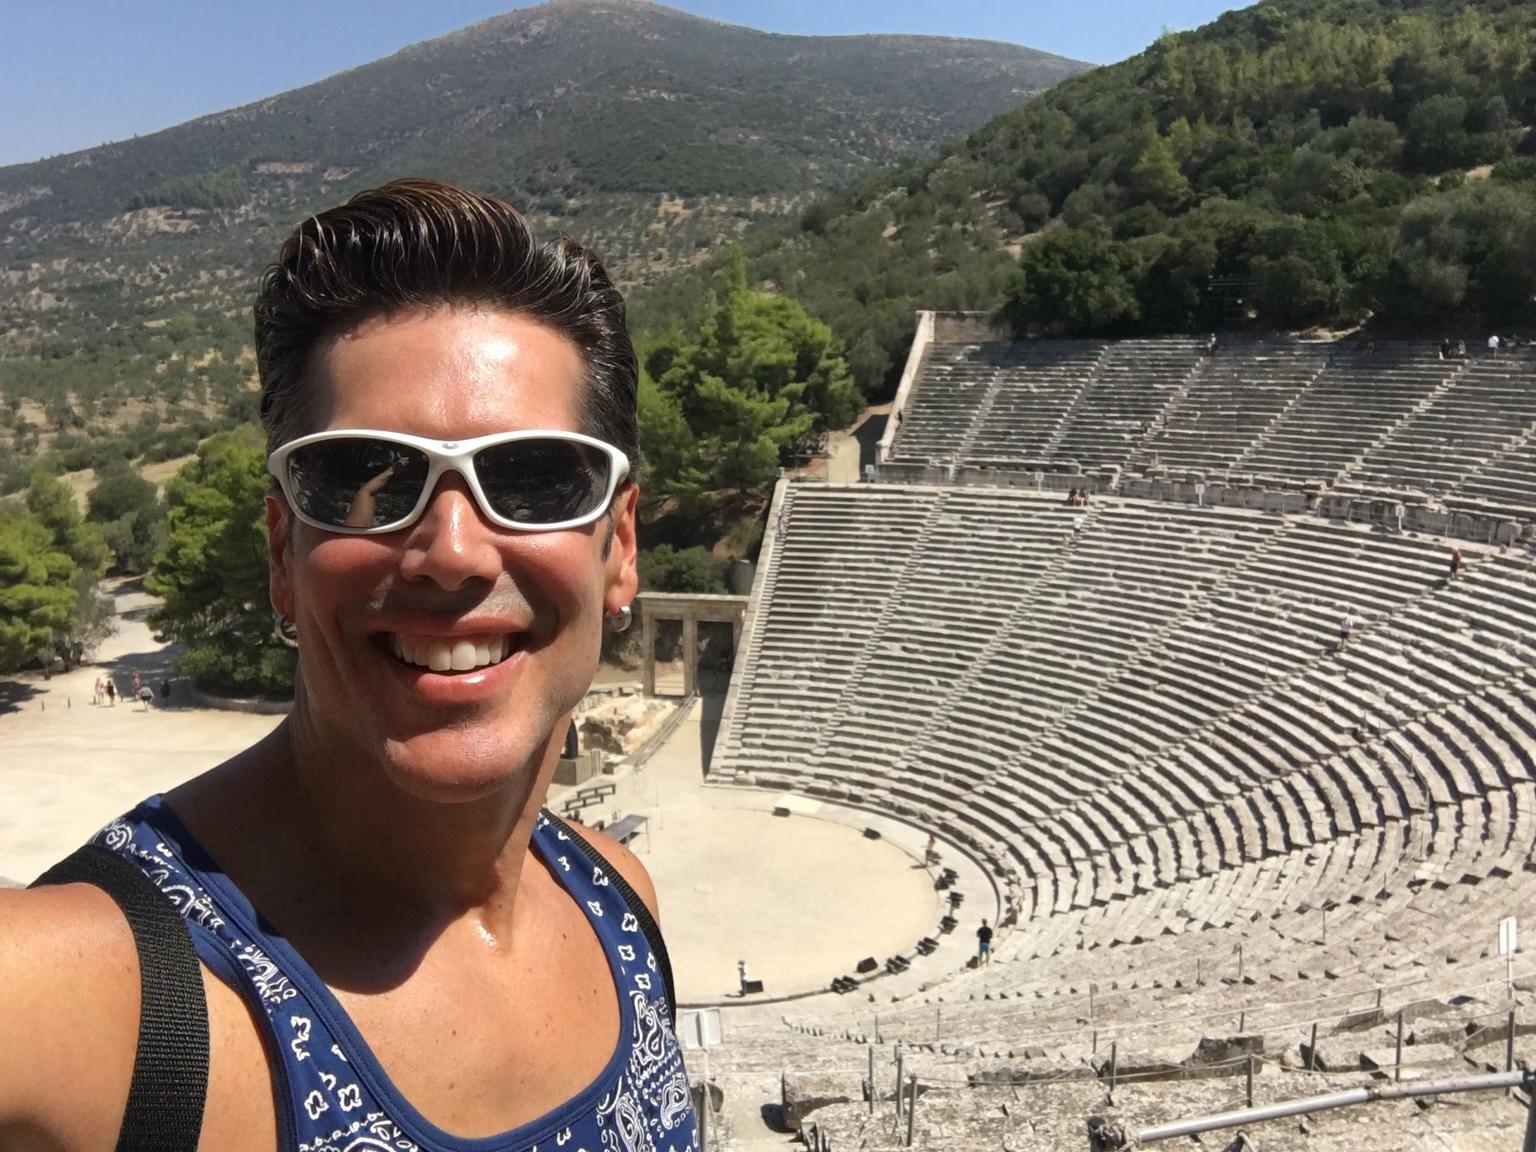 MÁS FOTOS, Peloponnese Highlights: Corinth Canal, Corinth, Mycenae, Nafplio, and Epidaurus